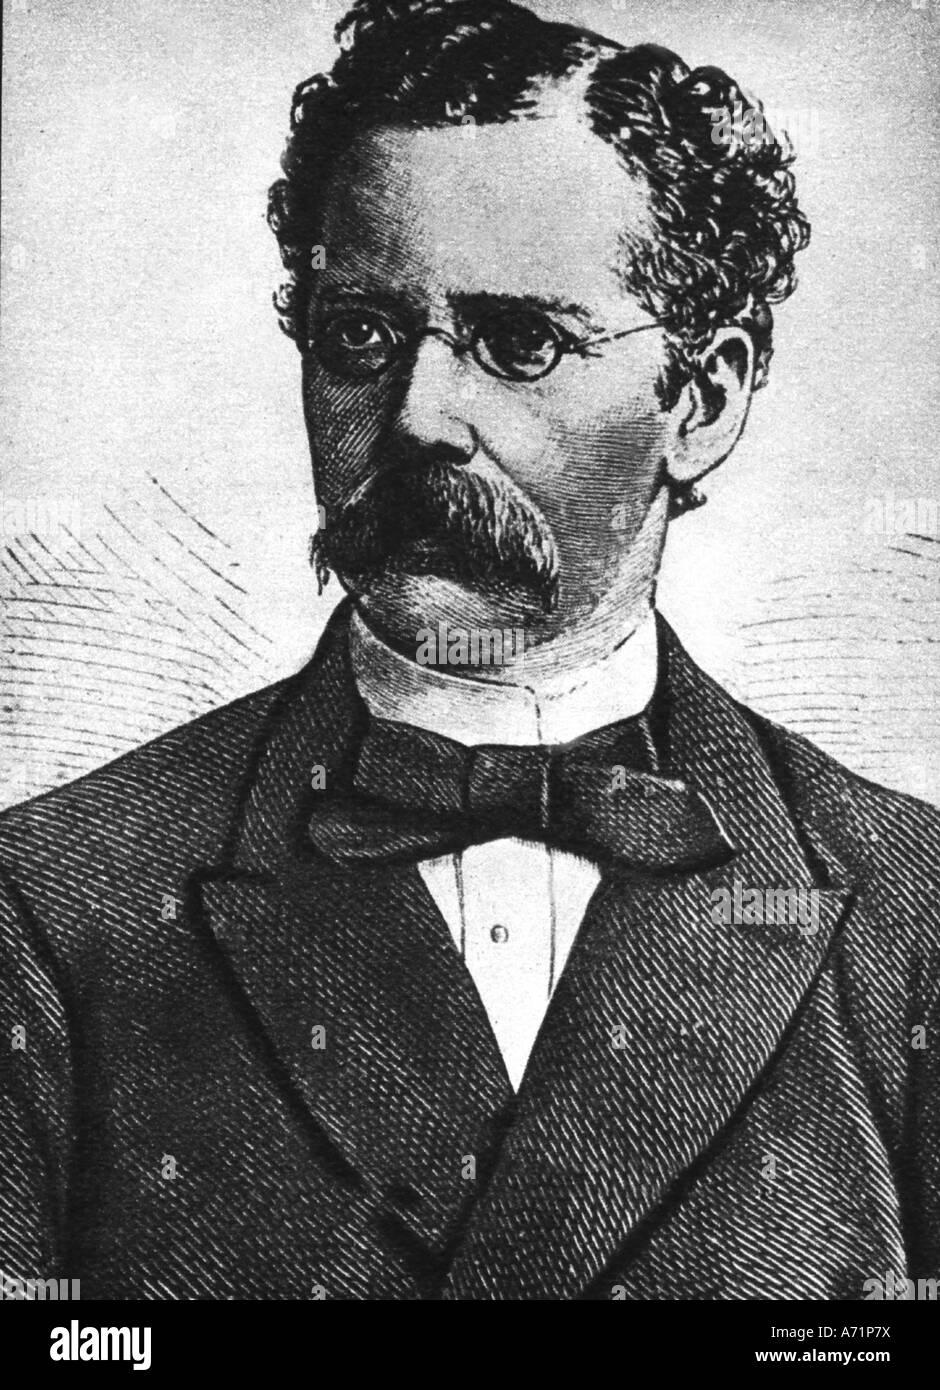 Lüderitz, Adolf, 16.7.1834 - 24.10.1886, German businessman, portrait, engraving late 19th century, Germany, - Stock Image